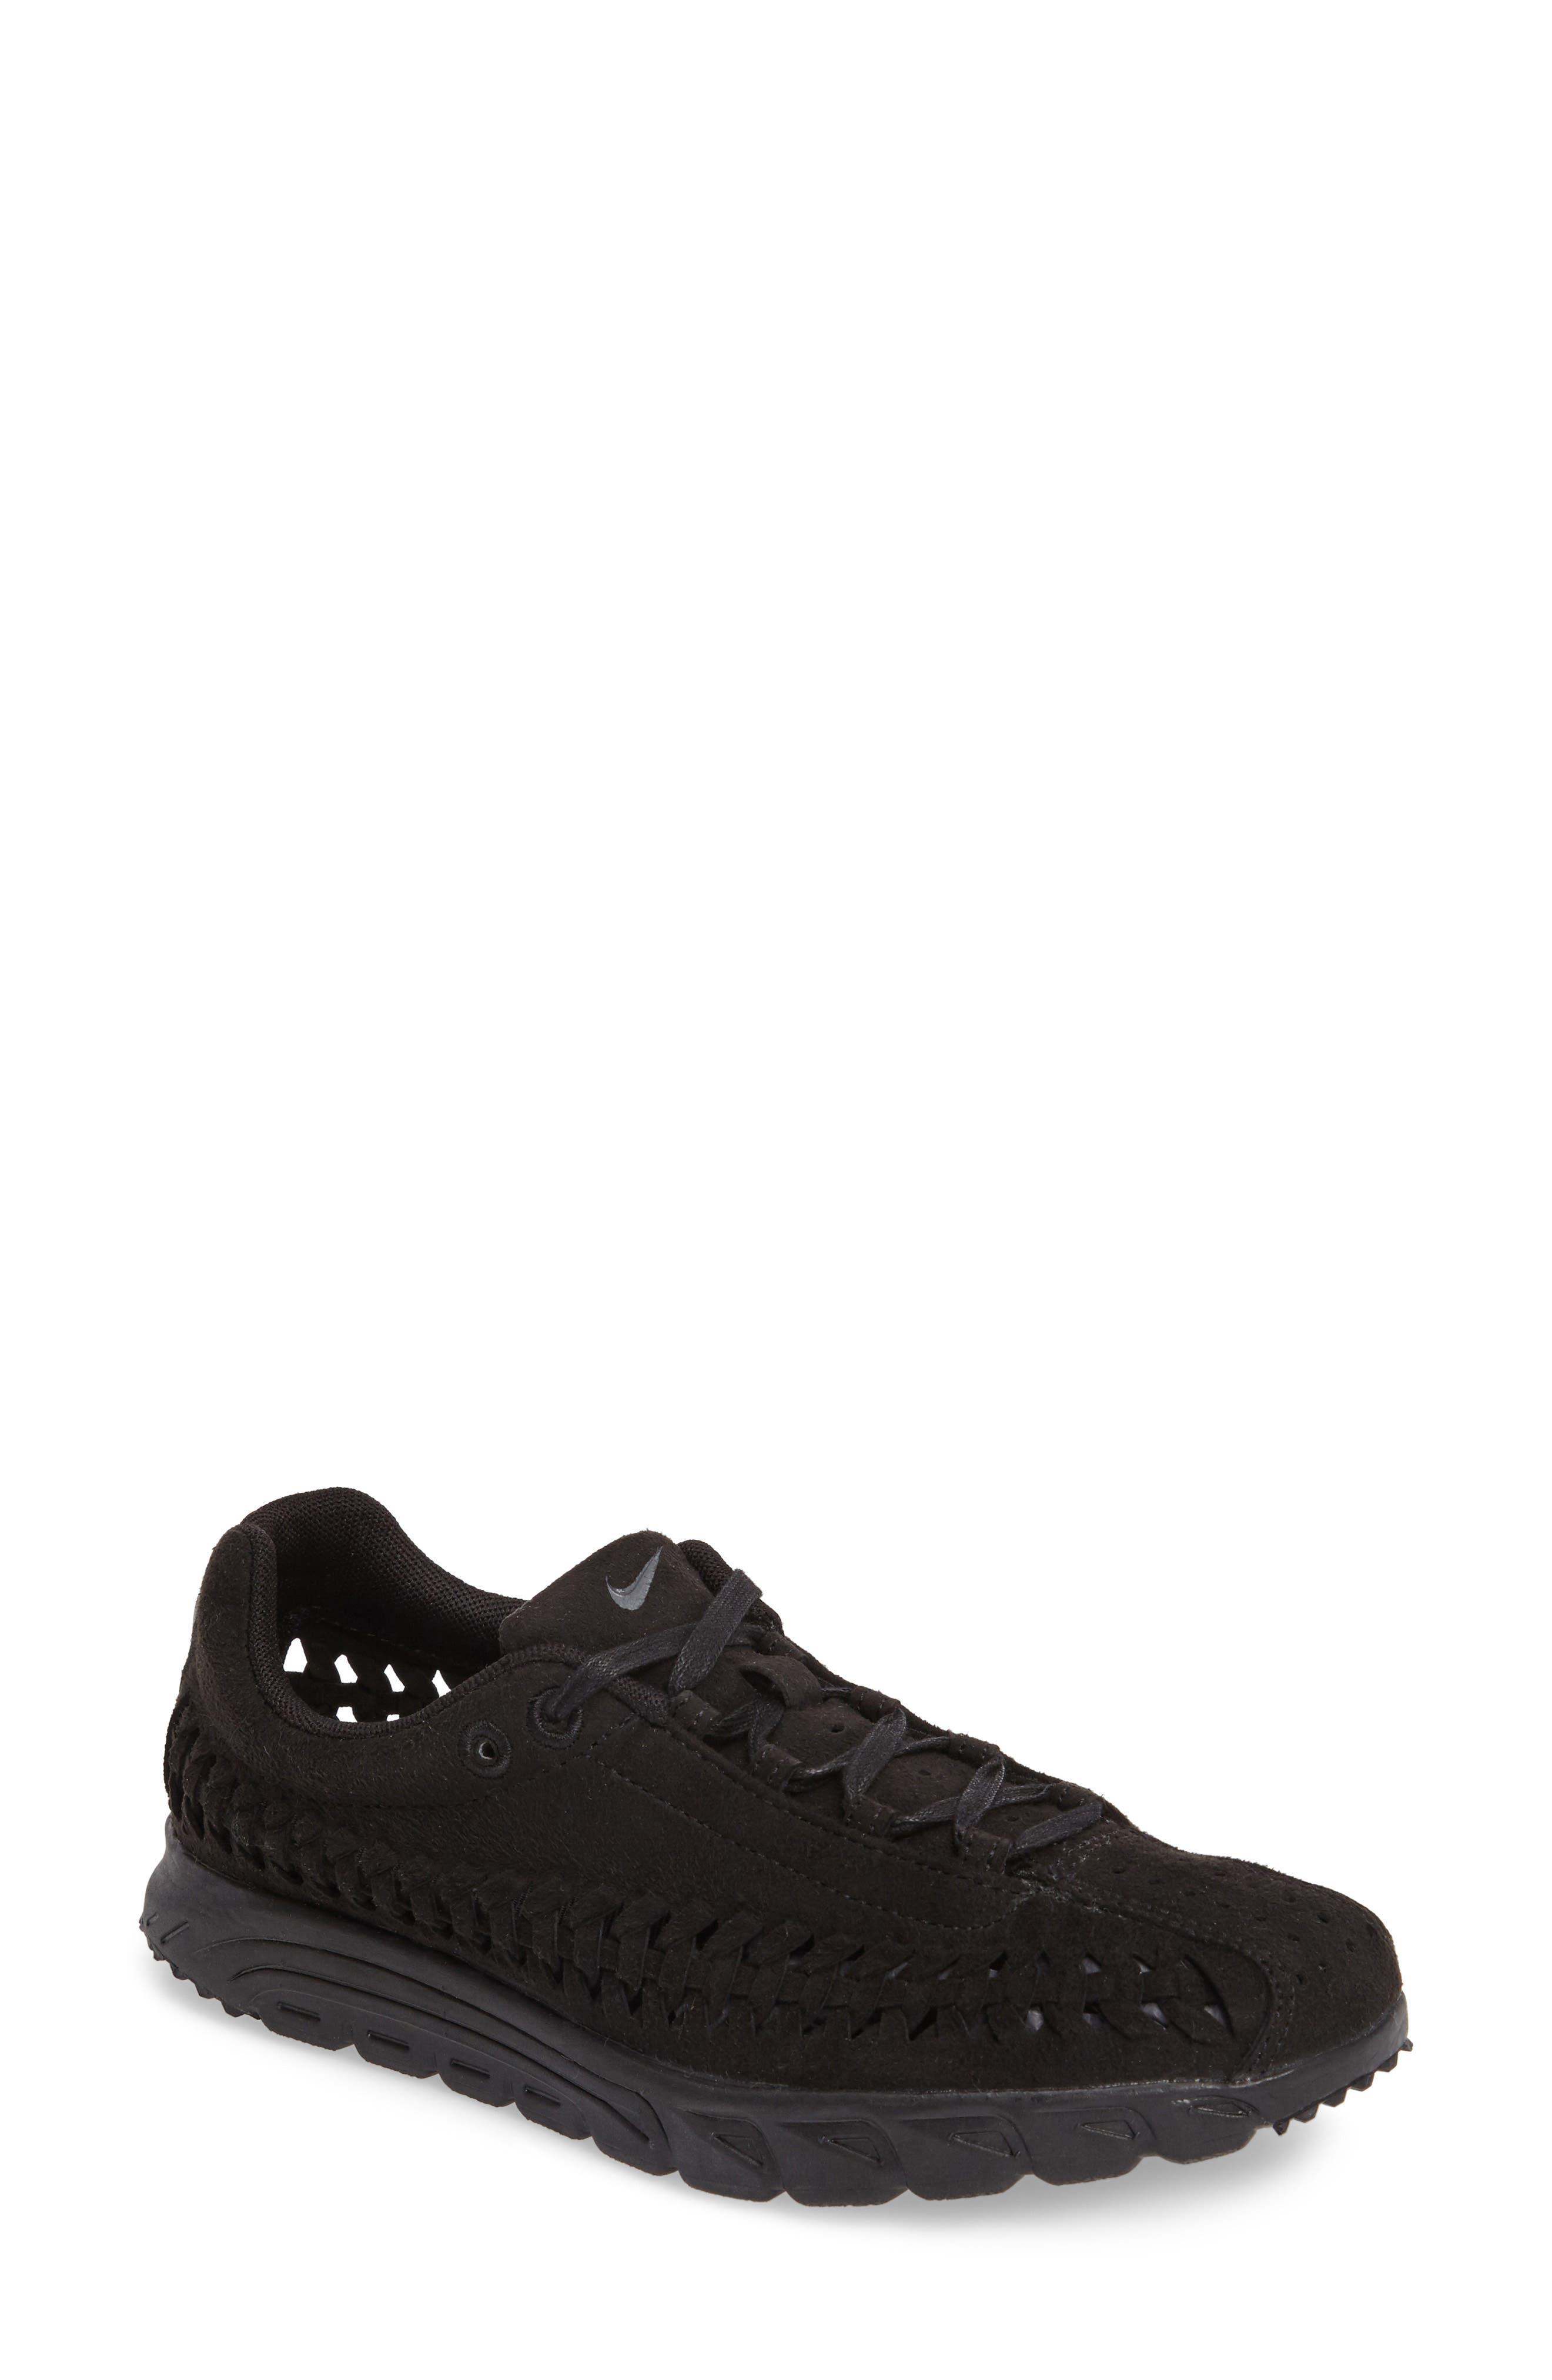 Main Image - Nike 'Mayfly Woven' Sneaker (Women)